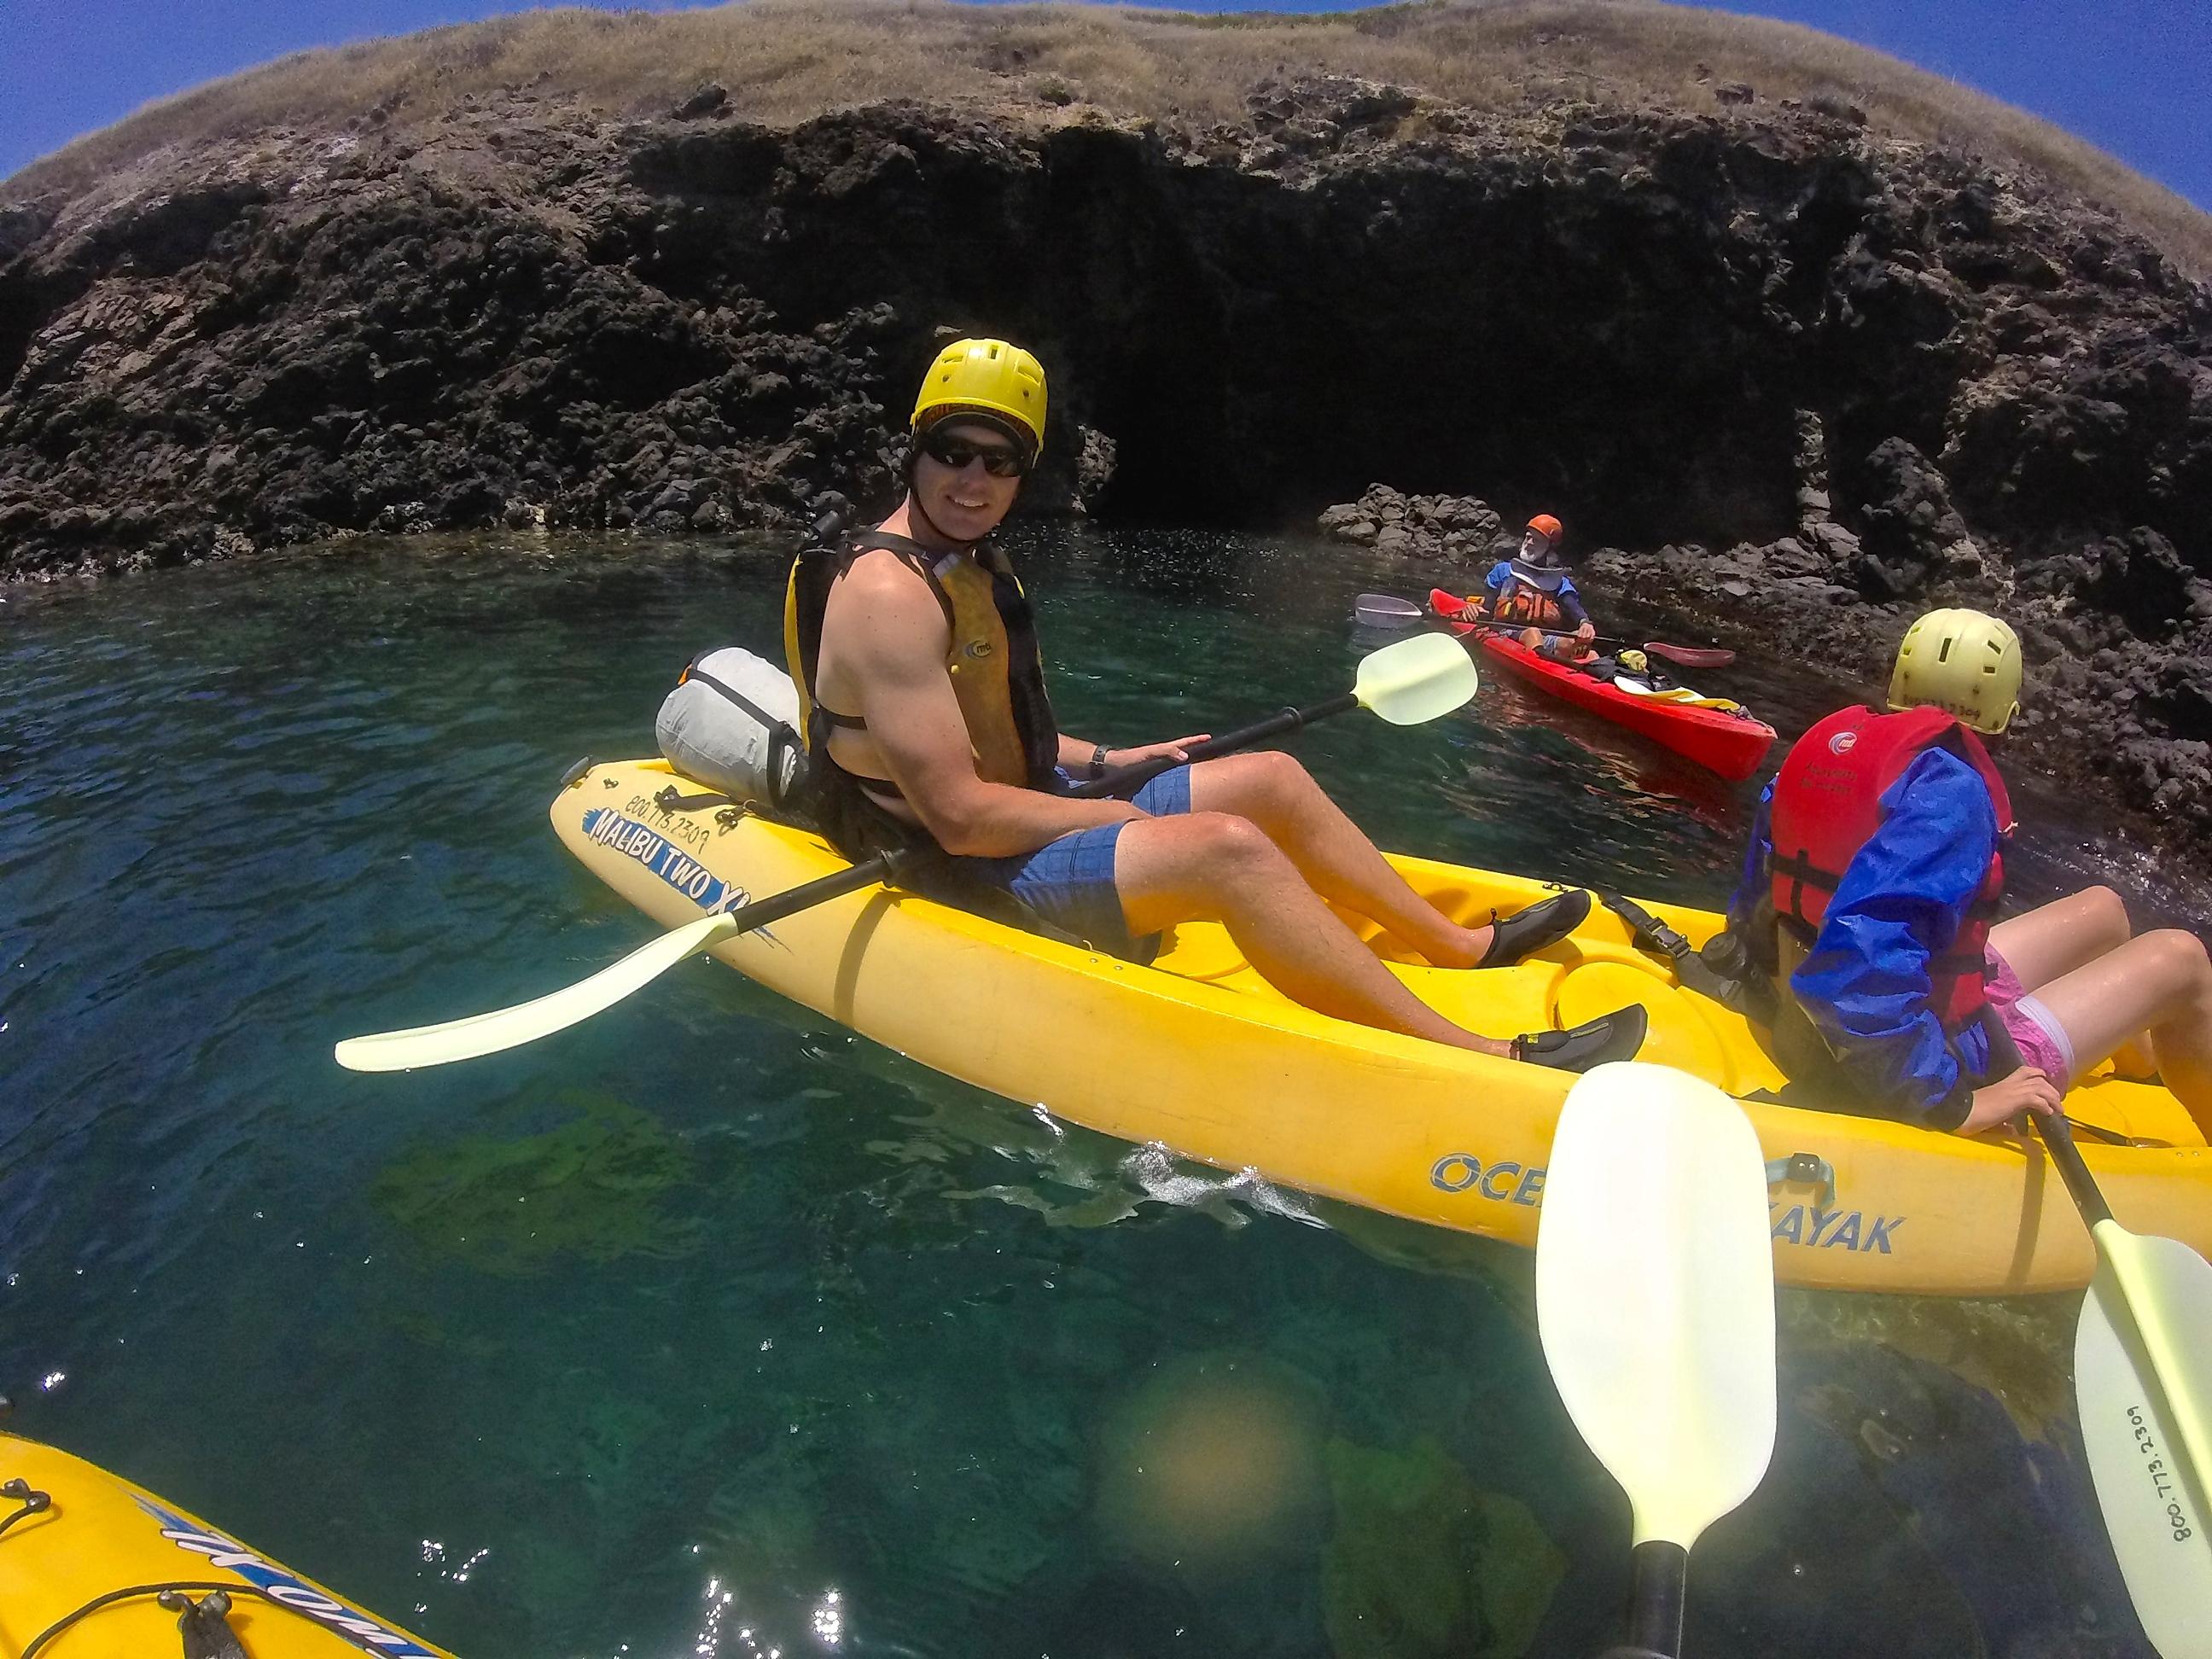 channel islands national park: kayaking around santa cruz | fit to